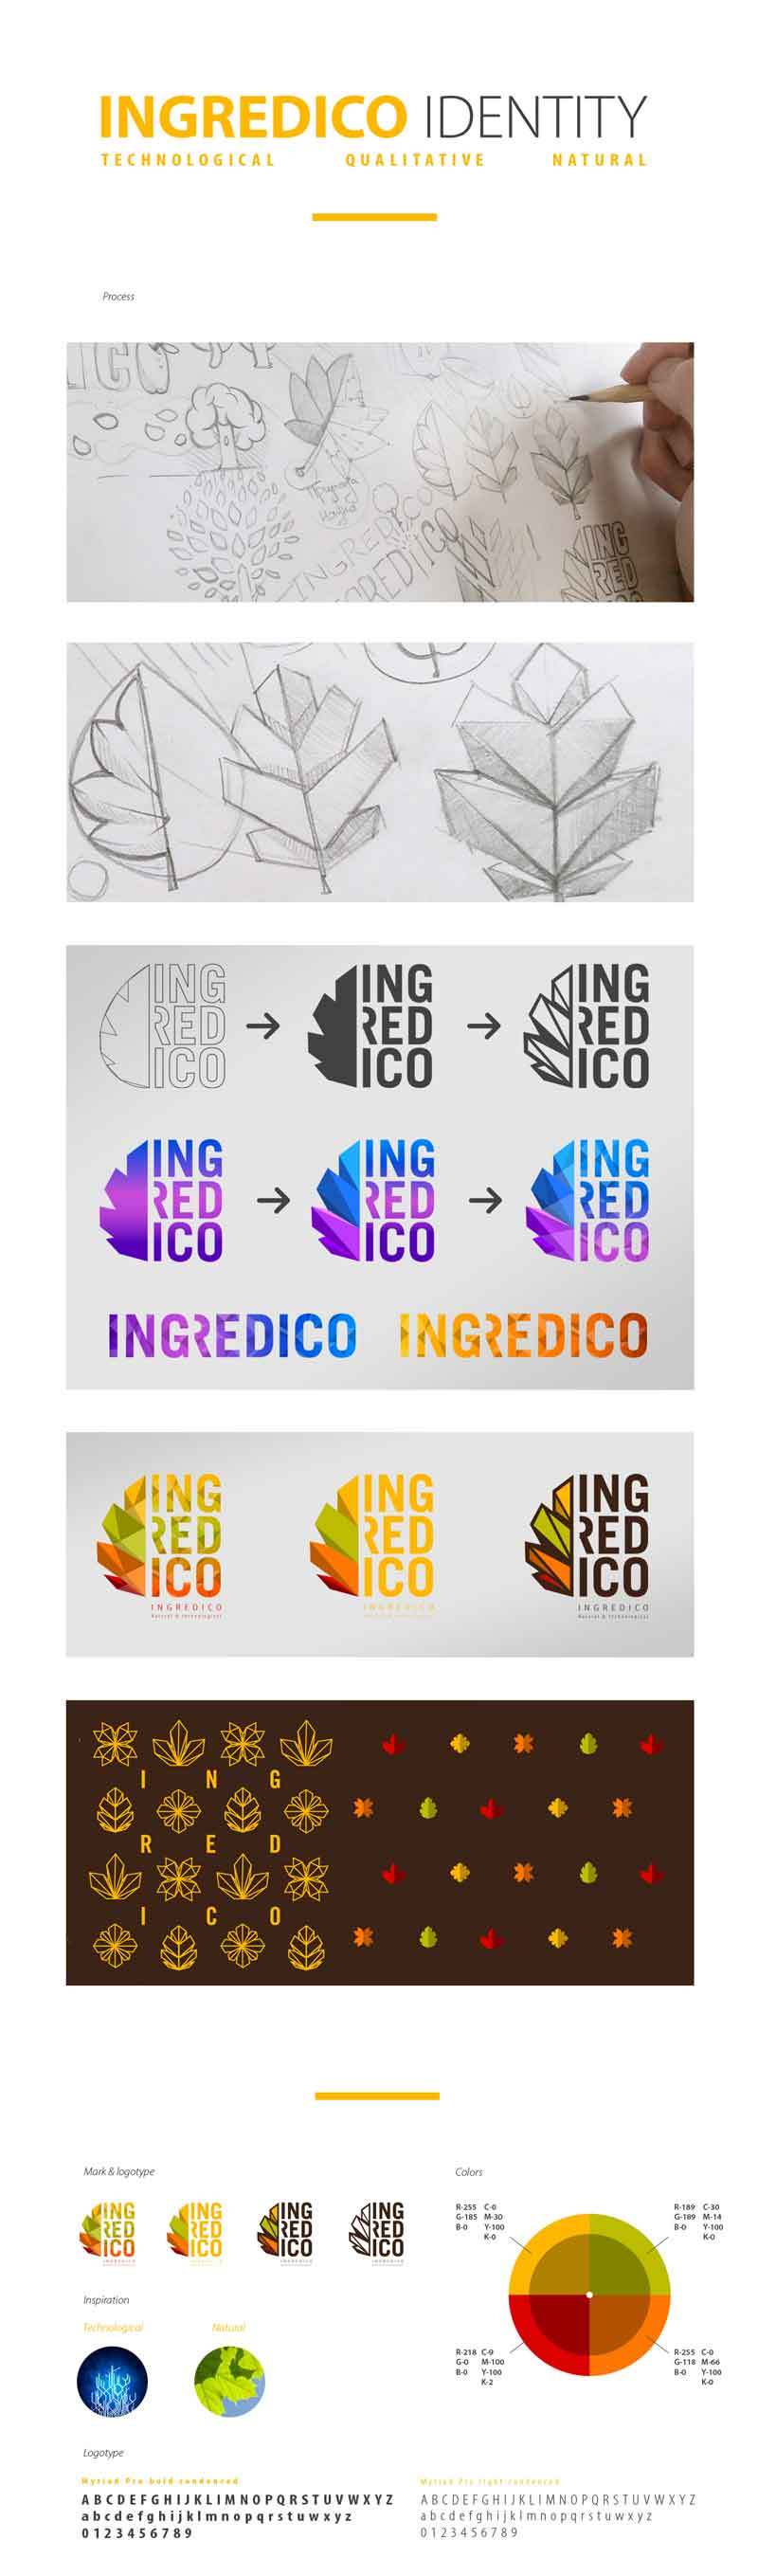 Ingredico в дизайне от Ingoma Fab.